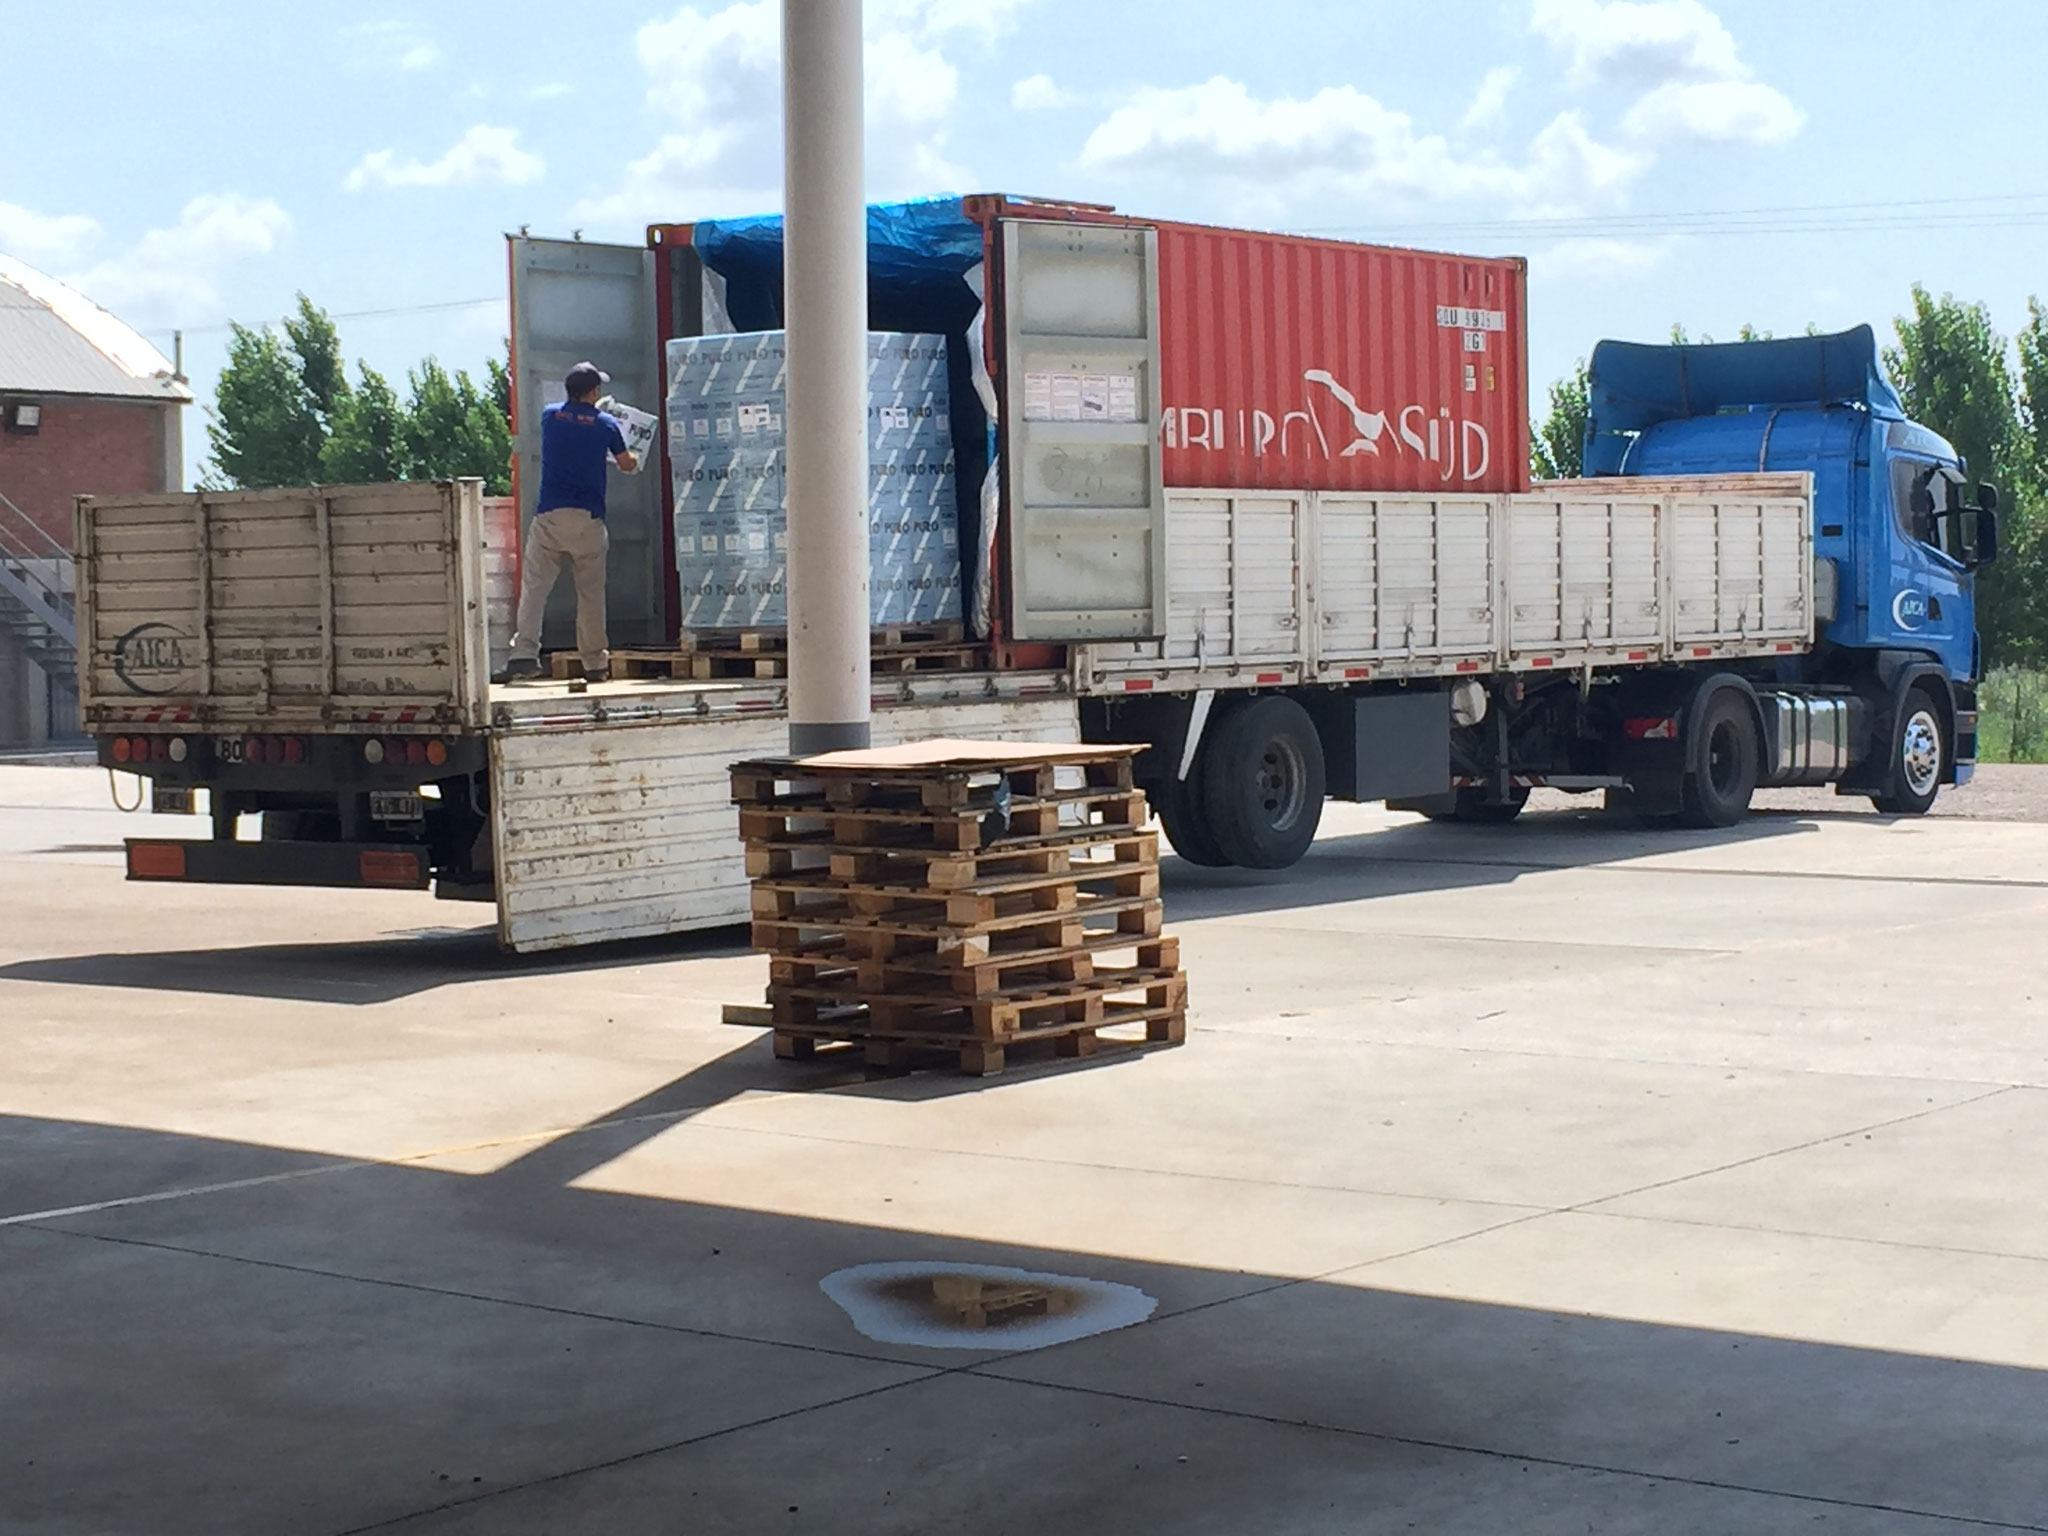 Verladung in Container nach Europa